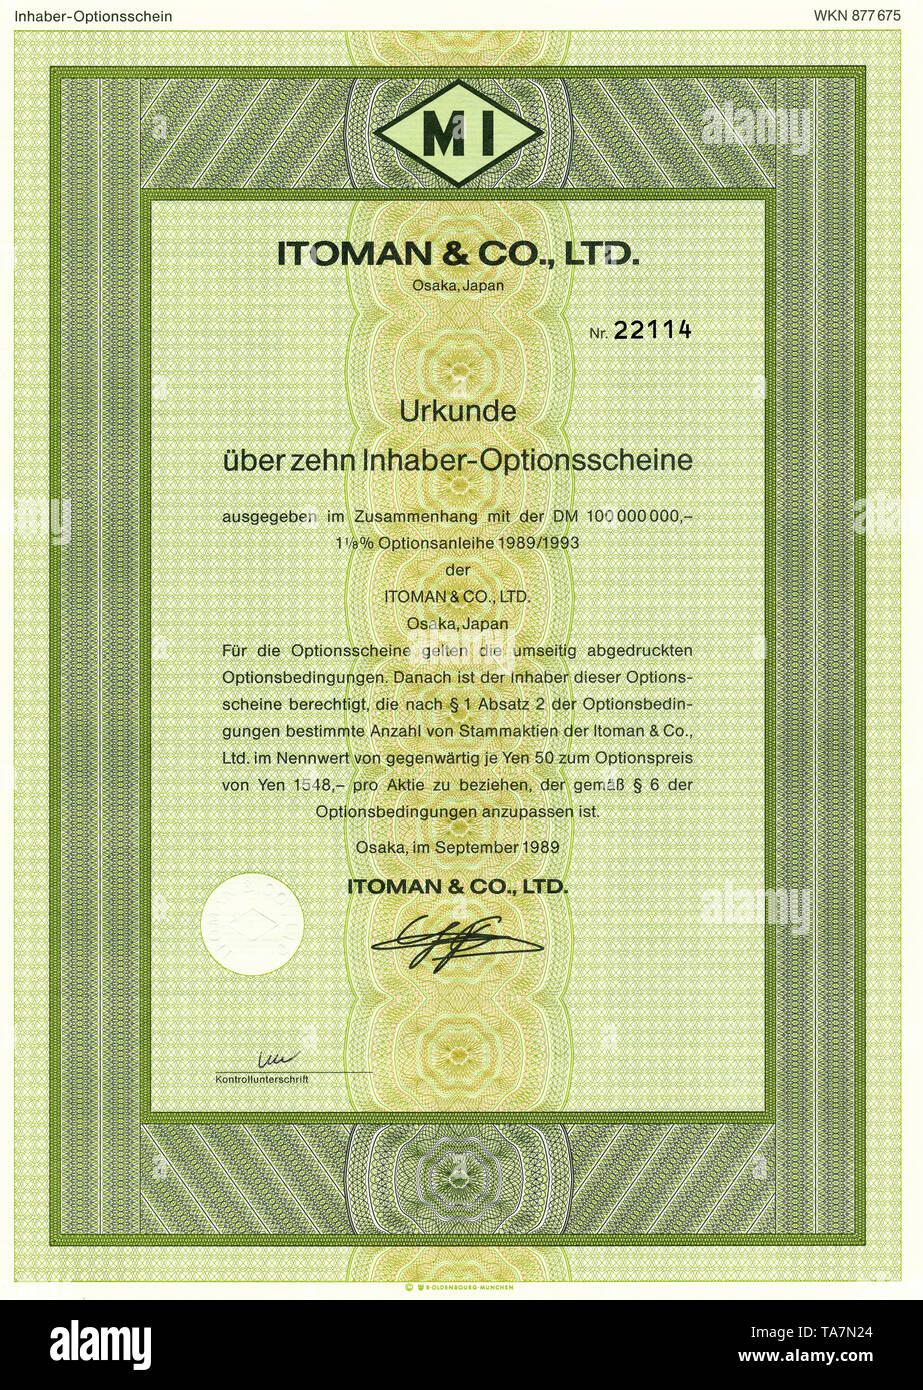 Historic stock certificate, Securities certificate, bearer warrant, Historisches Wertpapier, japanischer Inhaber-Optionsschein, Itoman & Co., Ltd., 1989, Osaka, Japan - Stock Image